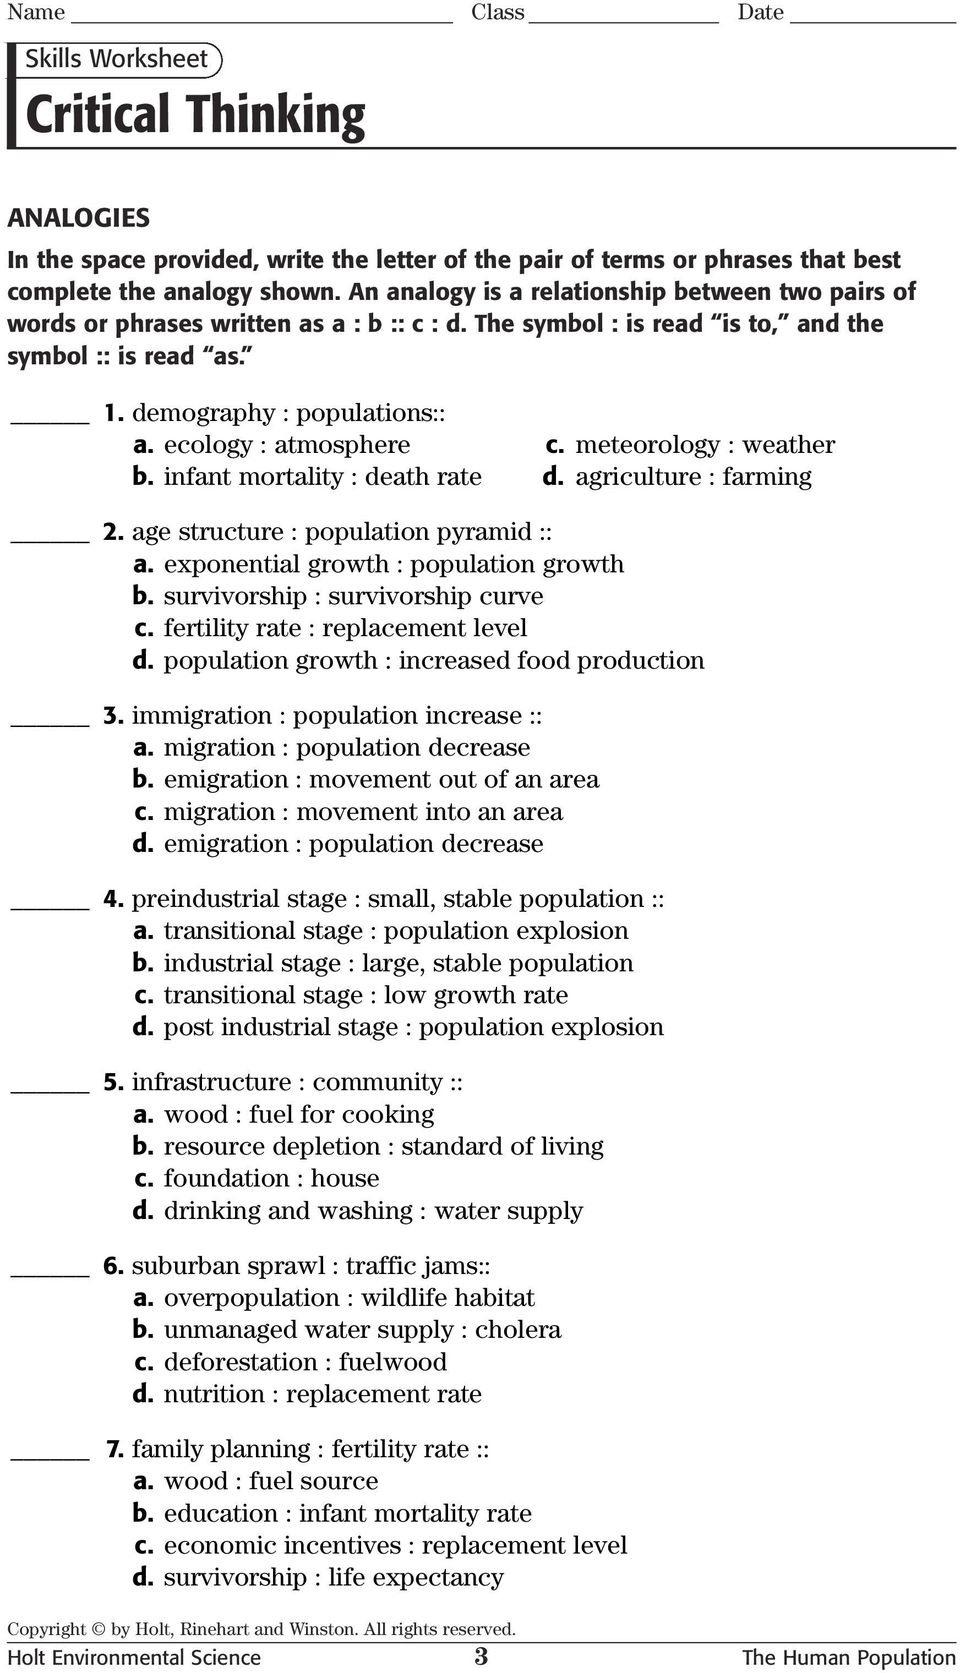 Critical Thinking Analogies Skills Worksheet  Pdf